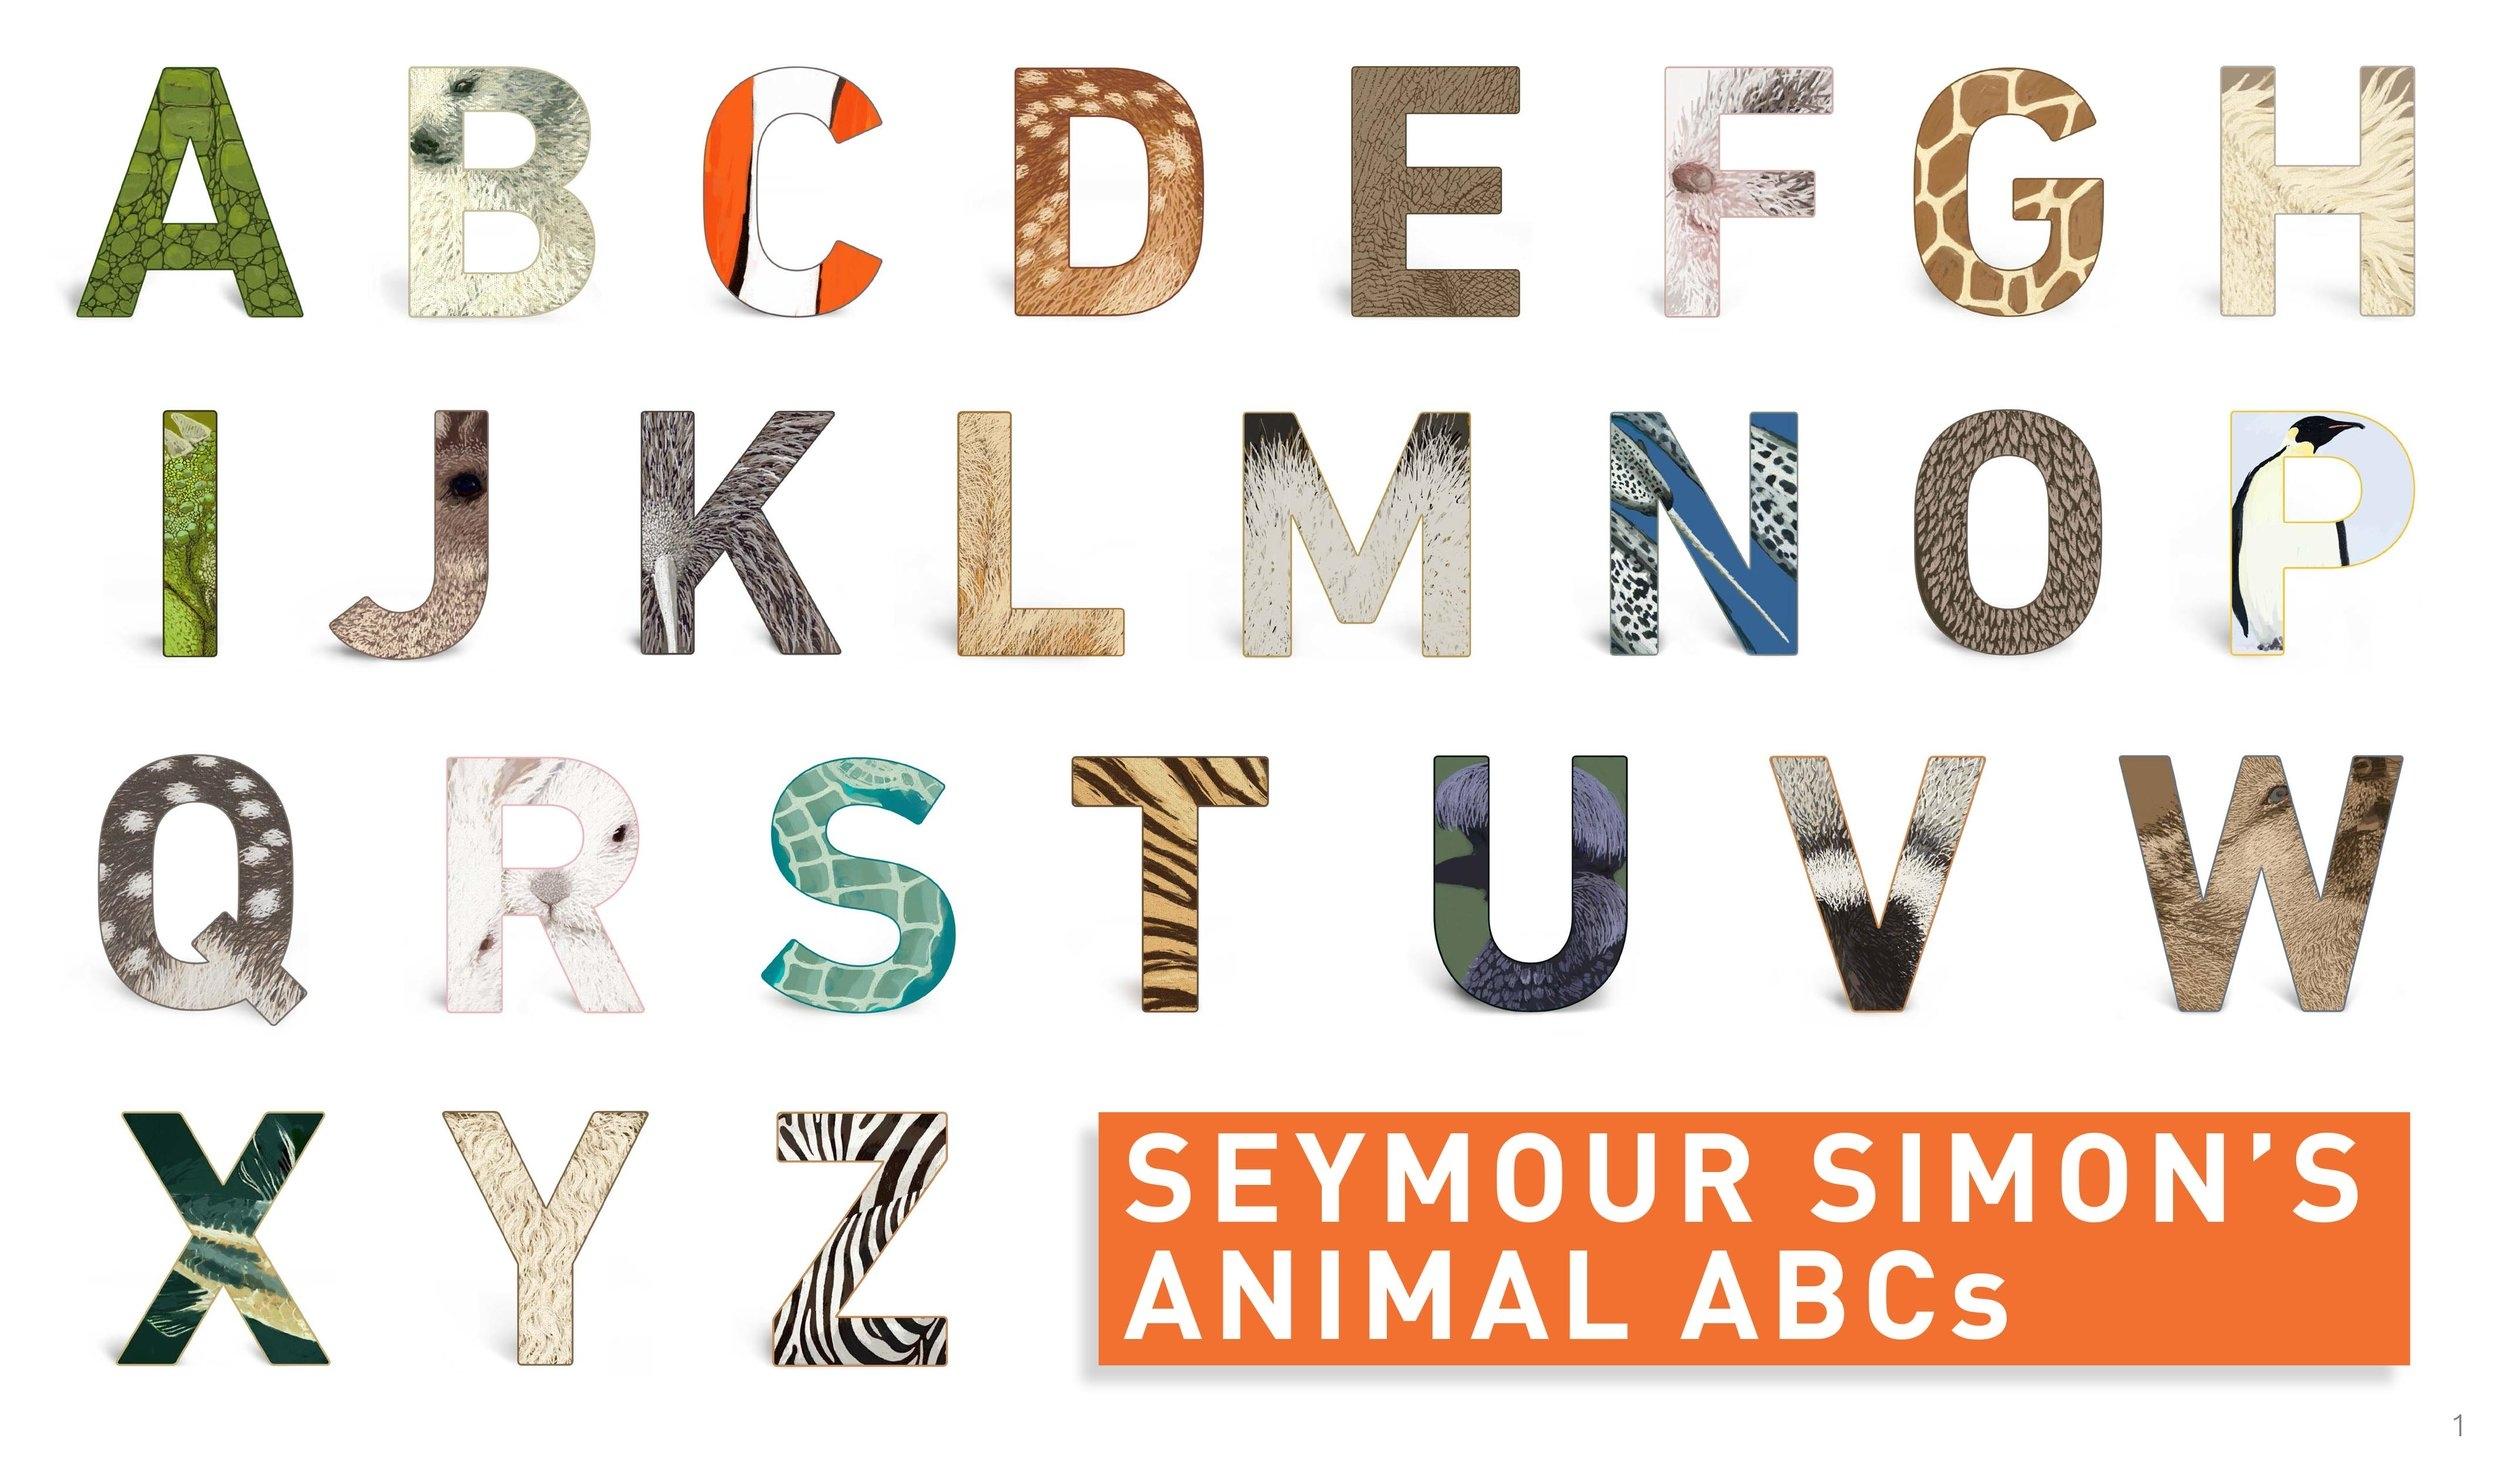 SSIMONs_Animal_ABCs_1.jpg